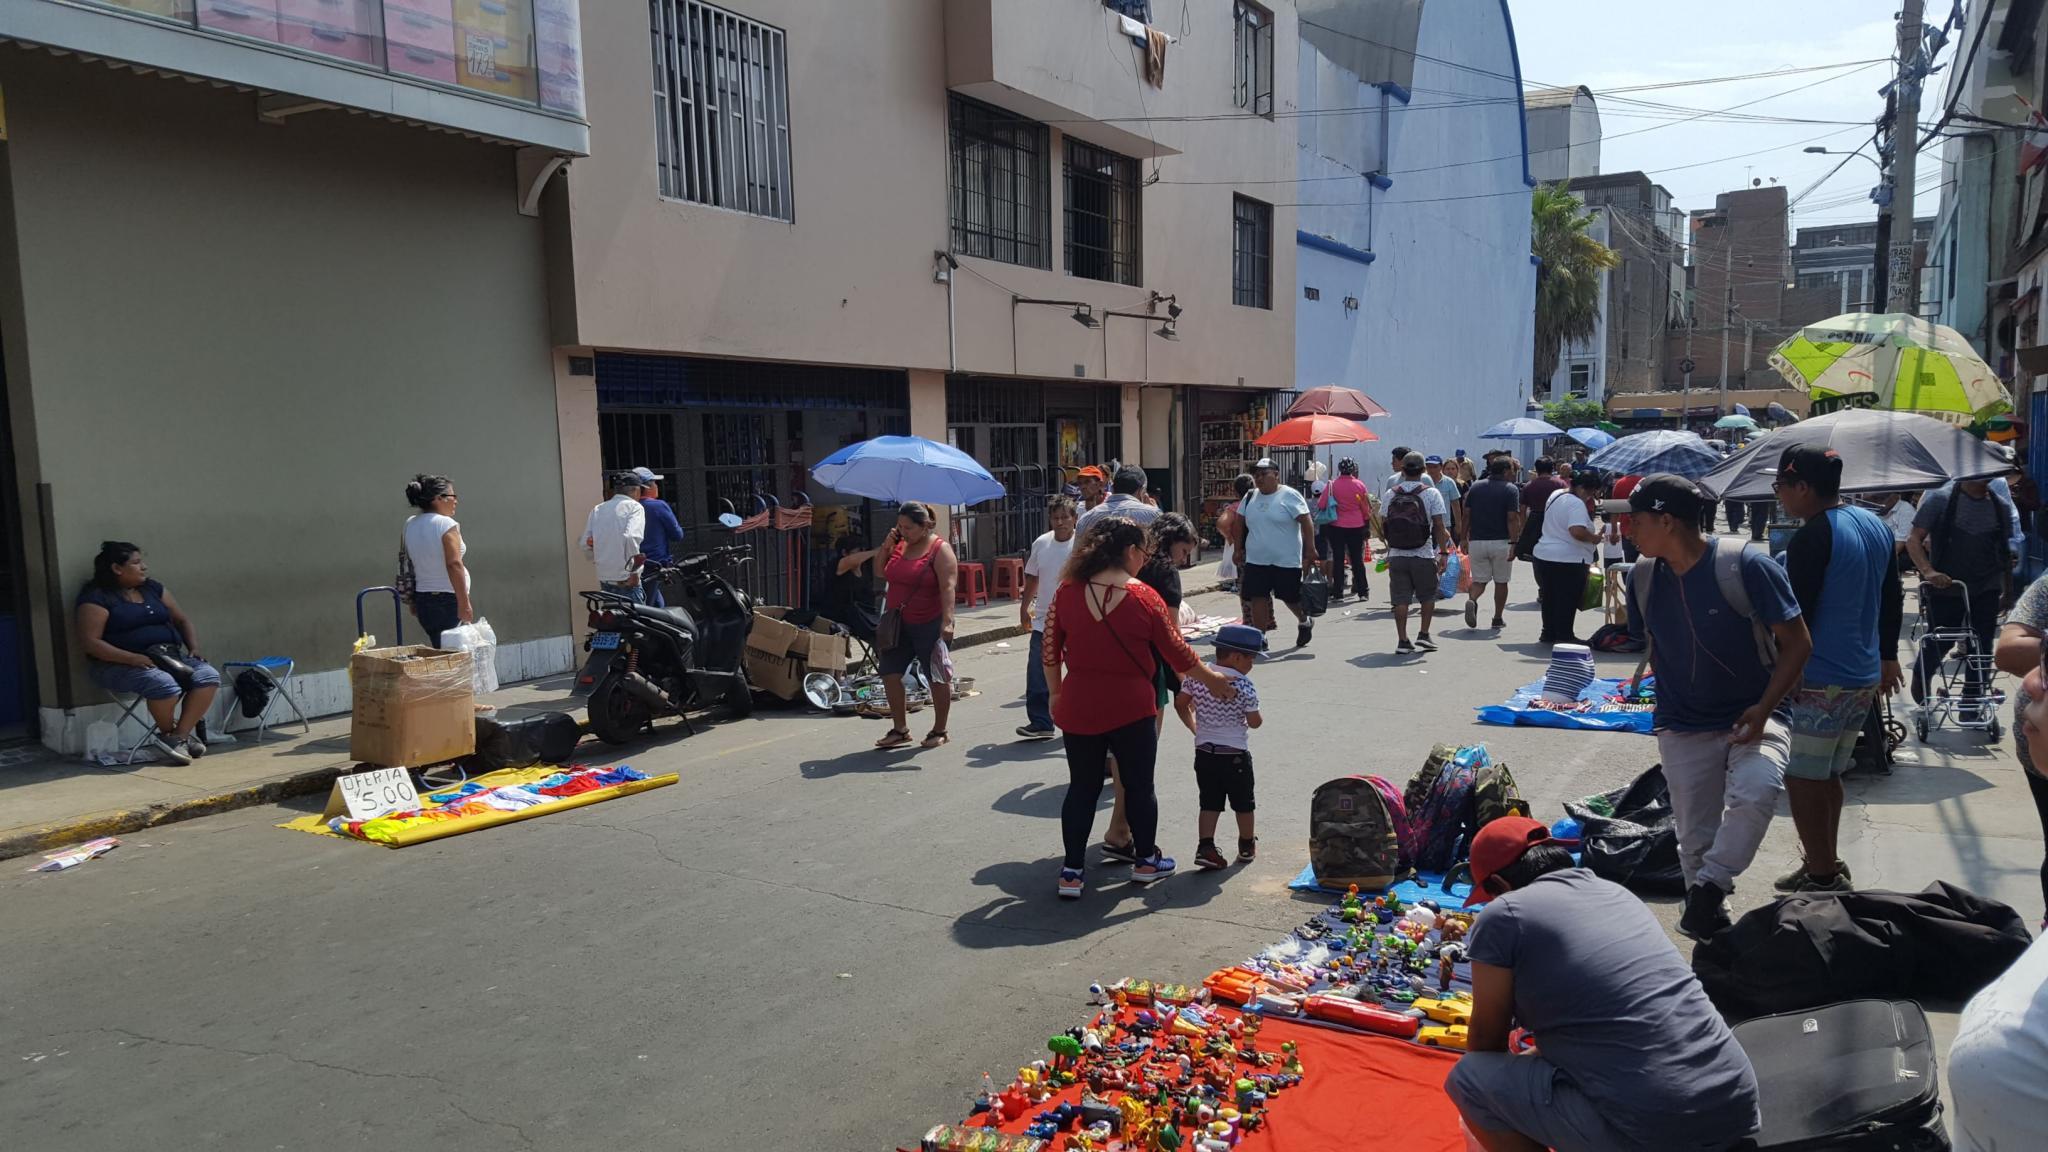 Peru: Lima, Cusco and Machu Picchu-downtown-chaos-jpg